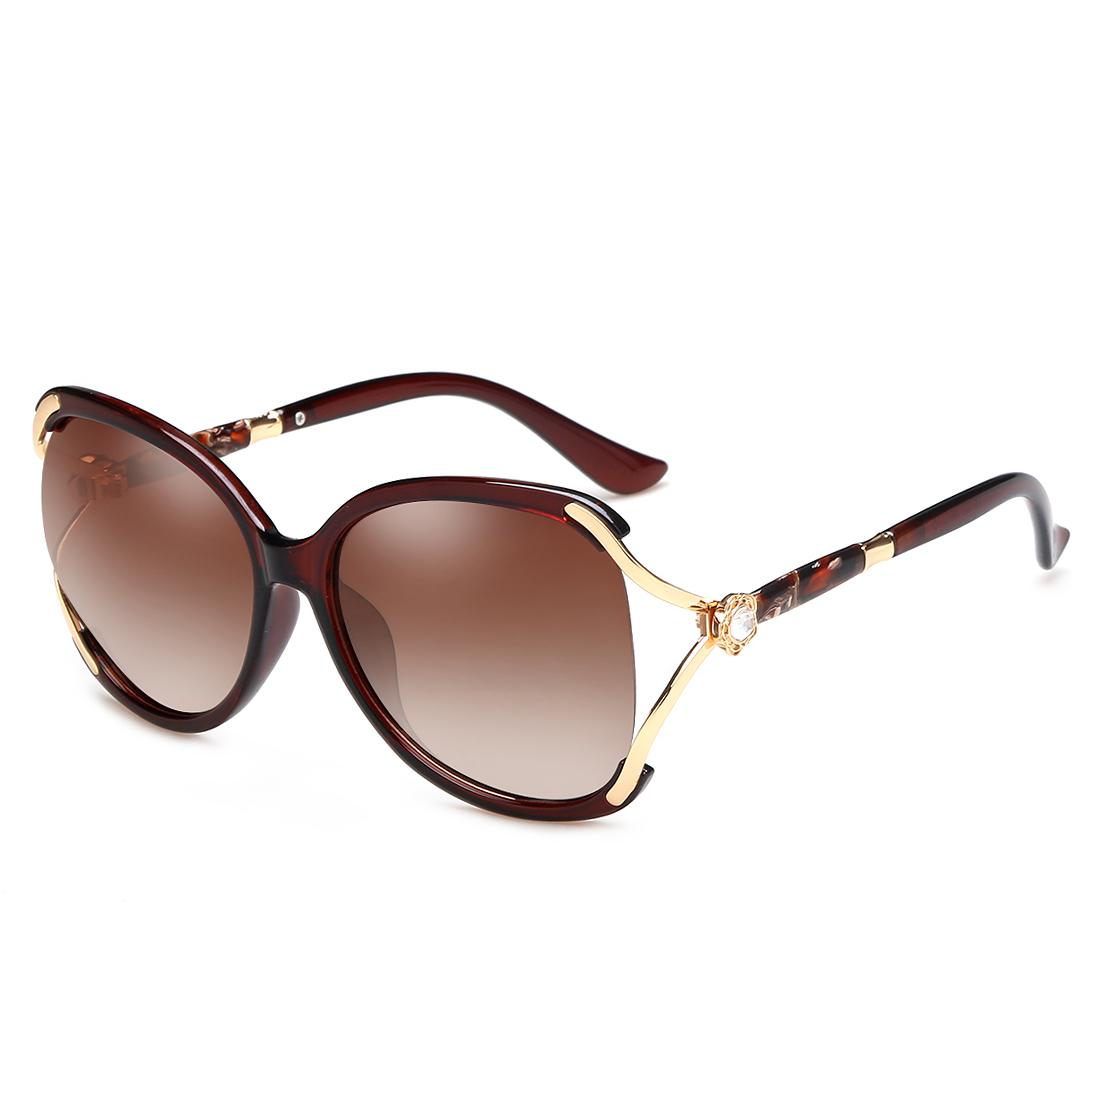 Elegan Shishang perempuan SHININGSTAR model terpolarisasi kaca mata Sunglasses